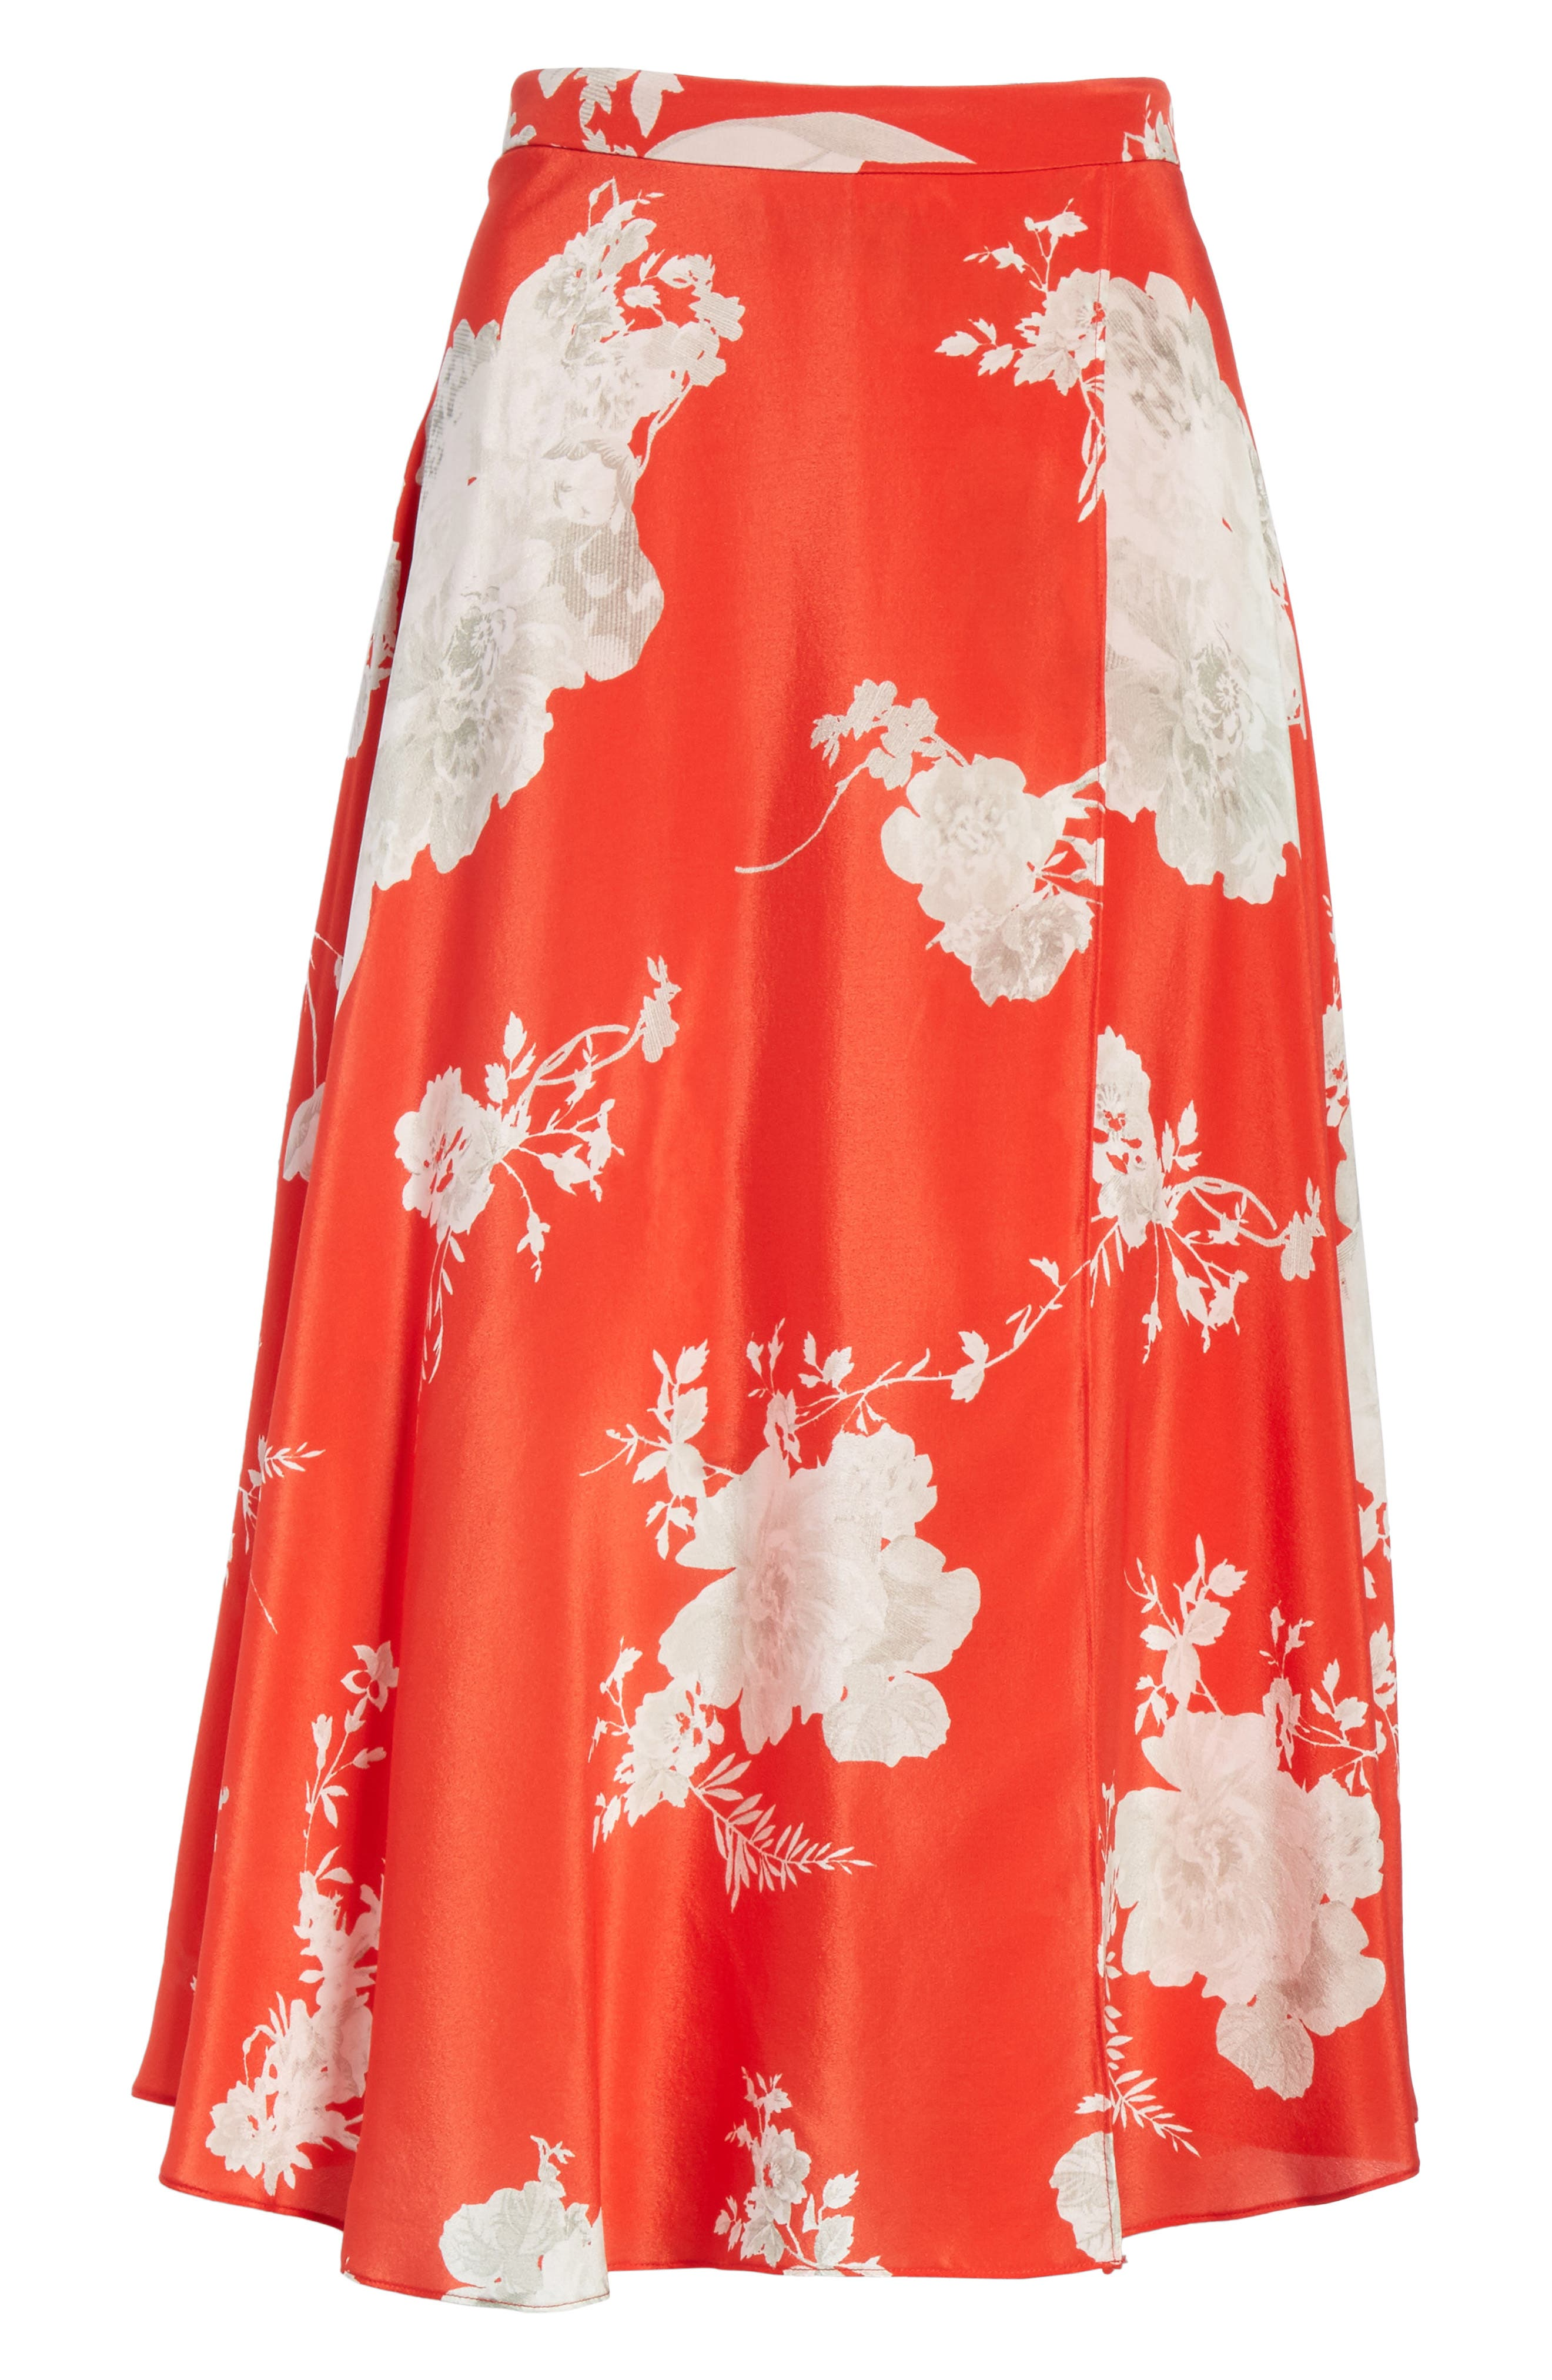 ALICE + OLIVIA,                             Nanette Faux Wrap Floral Silk Skirt,                             Alternate thumbnail 6, color,                             606